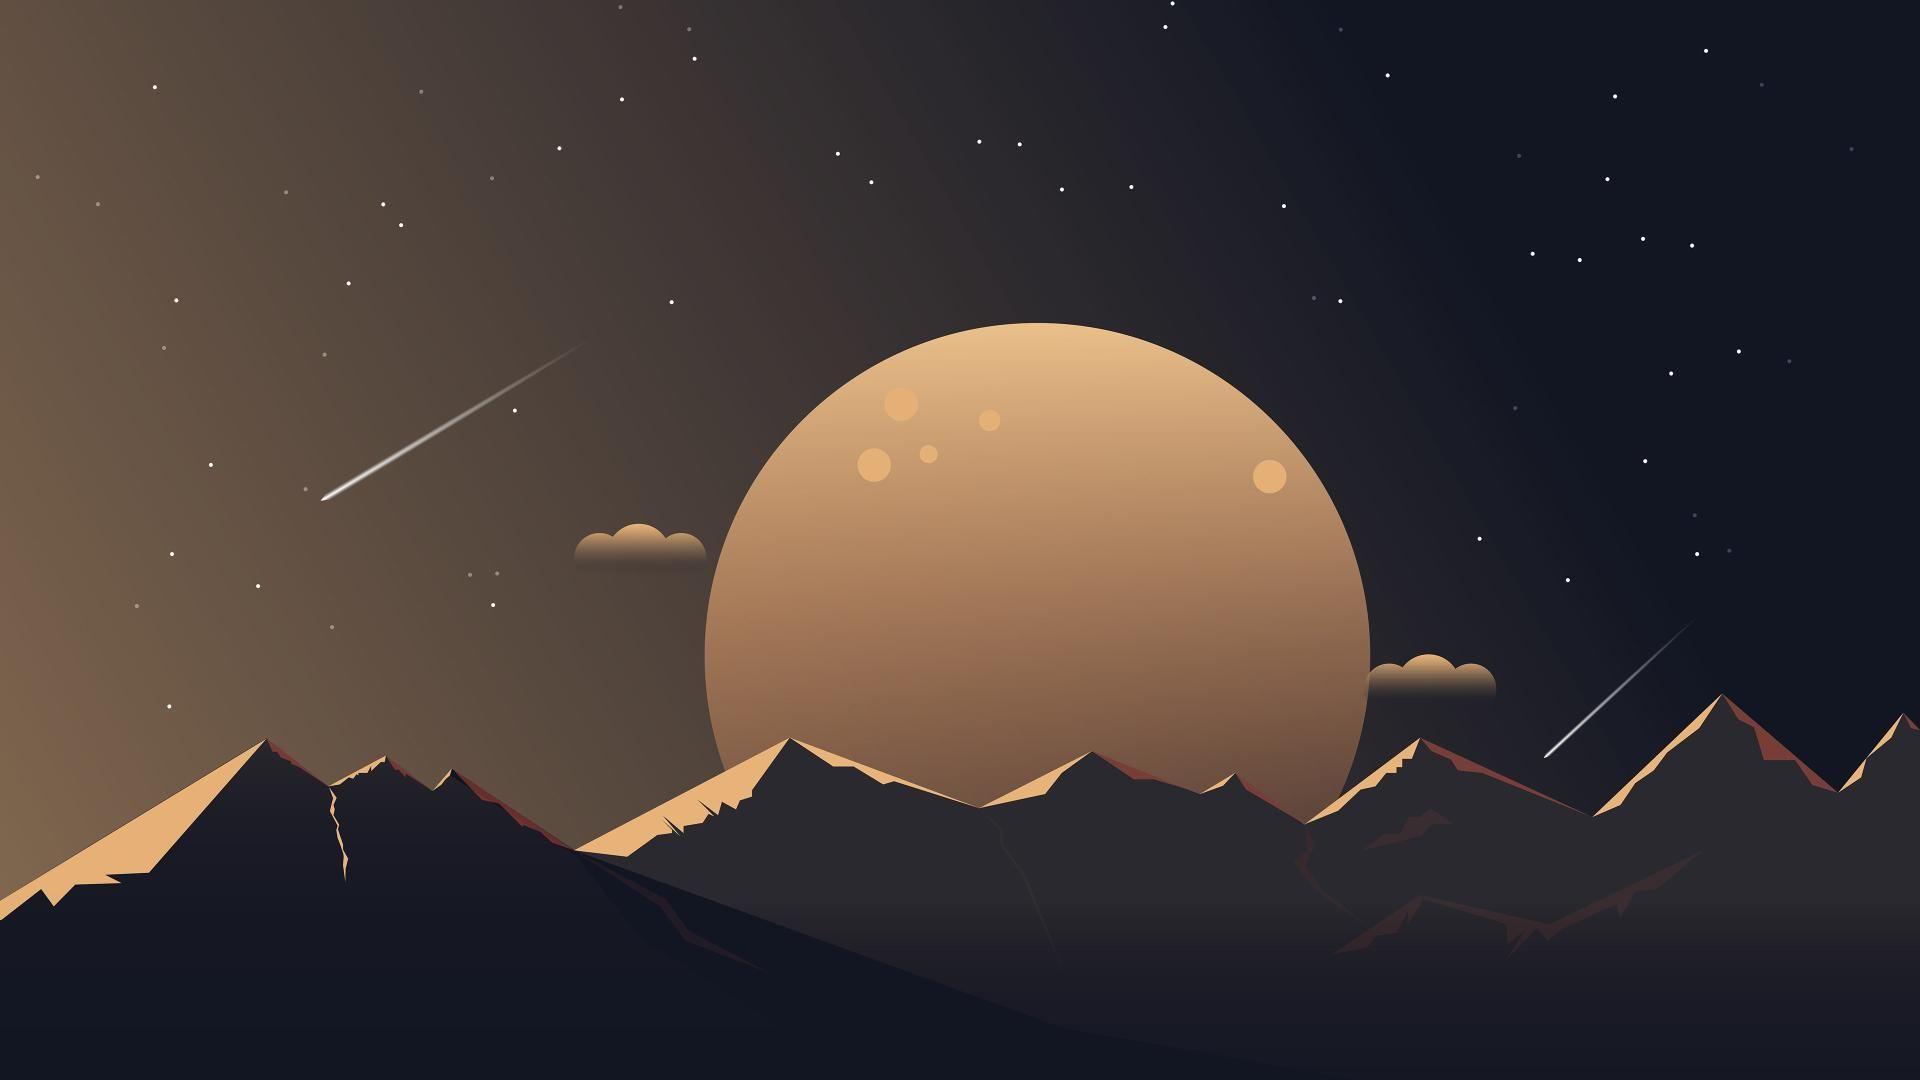 Artistic Moon 1920x1080 Computer wallpaper desktop wallpapers 1920x1080